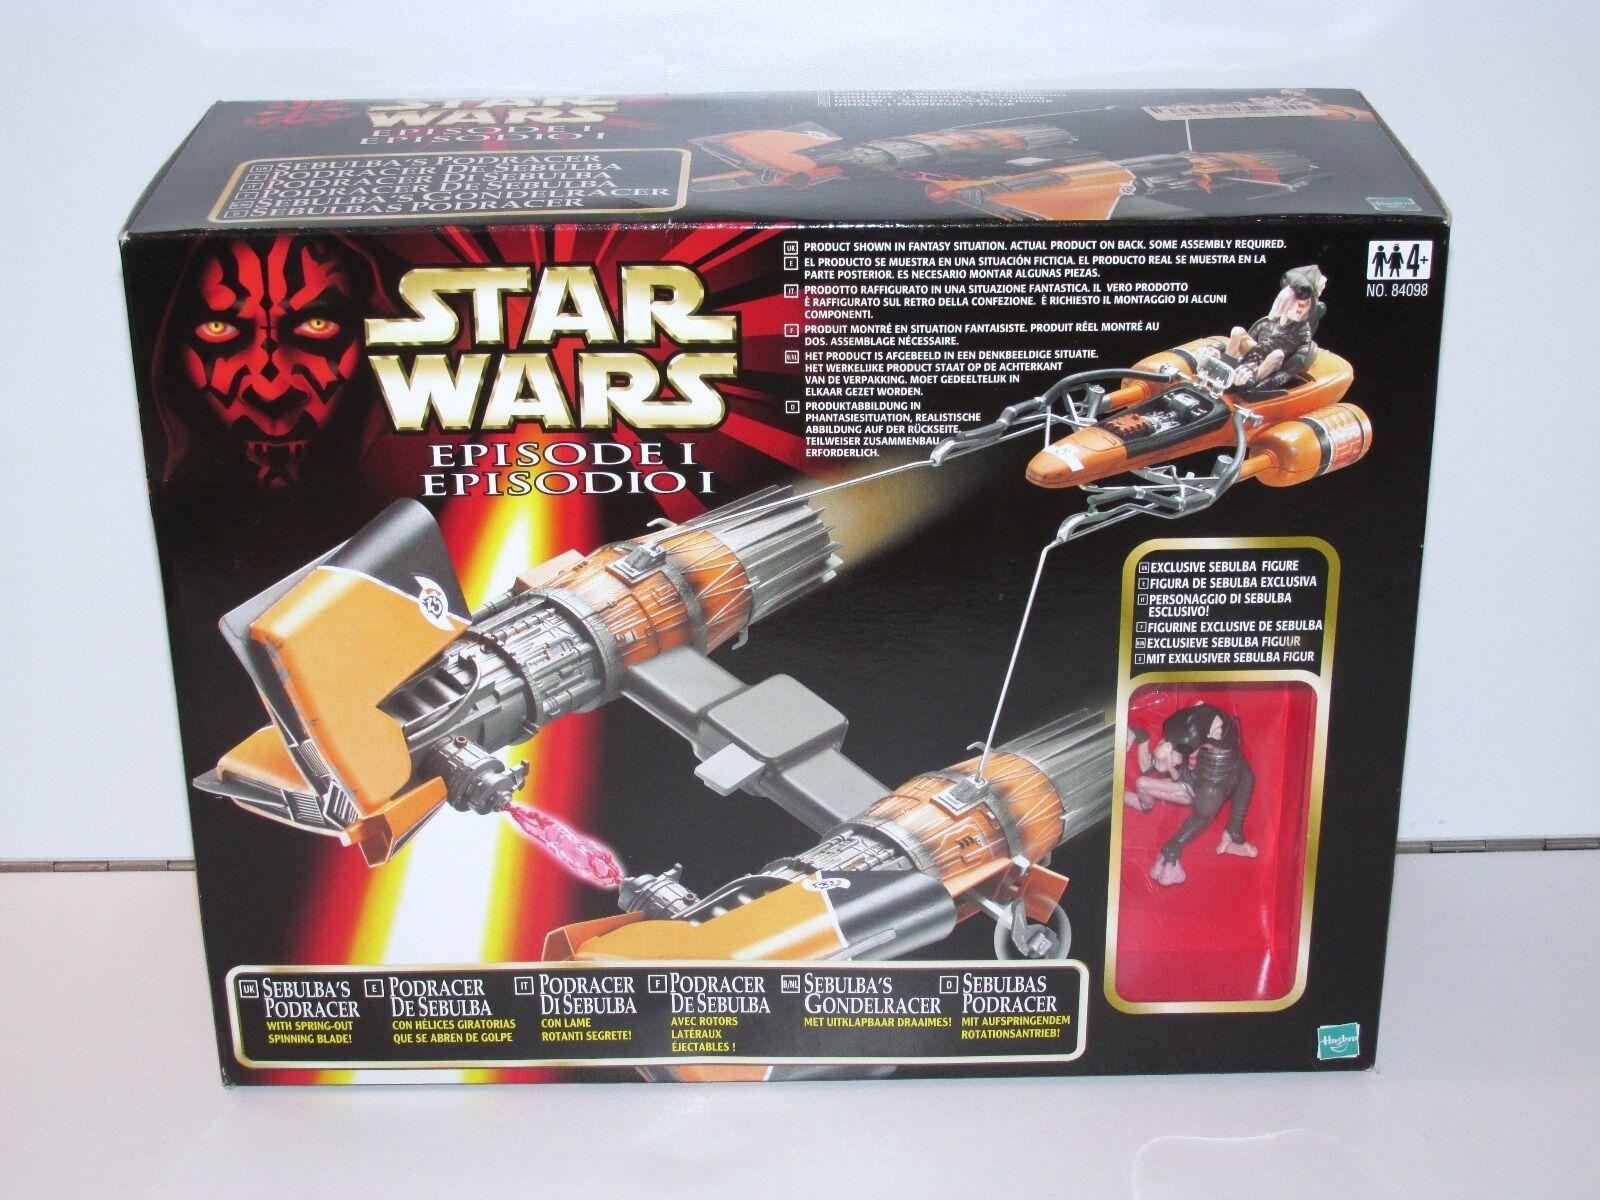 Star wars episode i 1999 sebulba podrenner mib hasbro